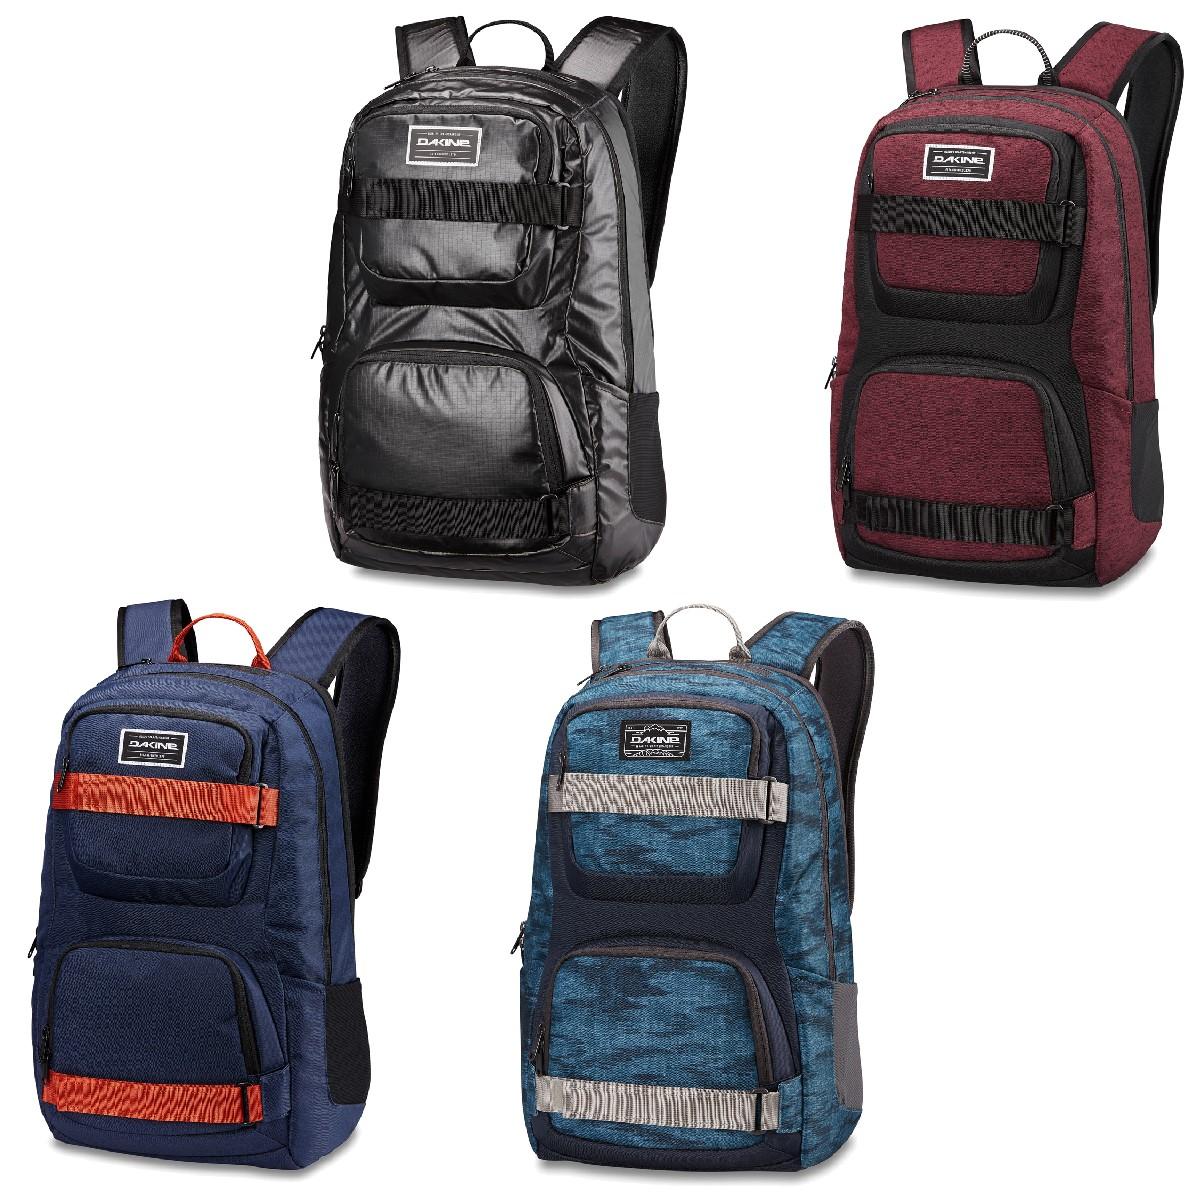 9dec4e9b20f4c Dakine Rucksack Duel Pack 26 Liter Laptop Schulrucksack Backpack ...